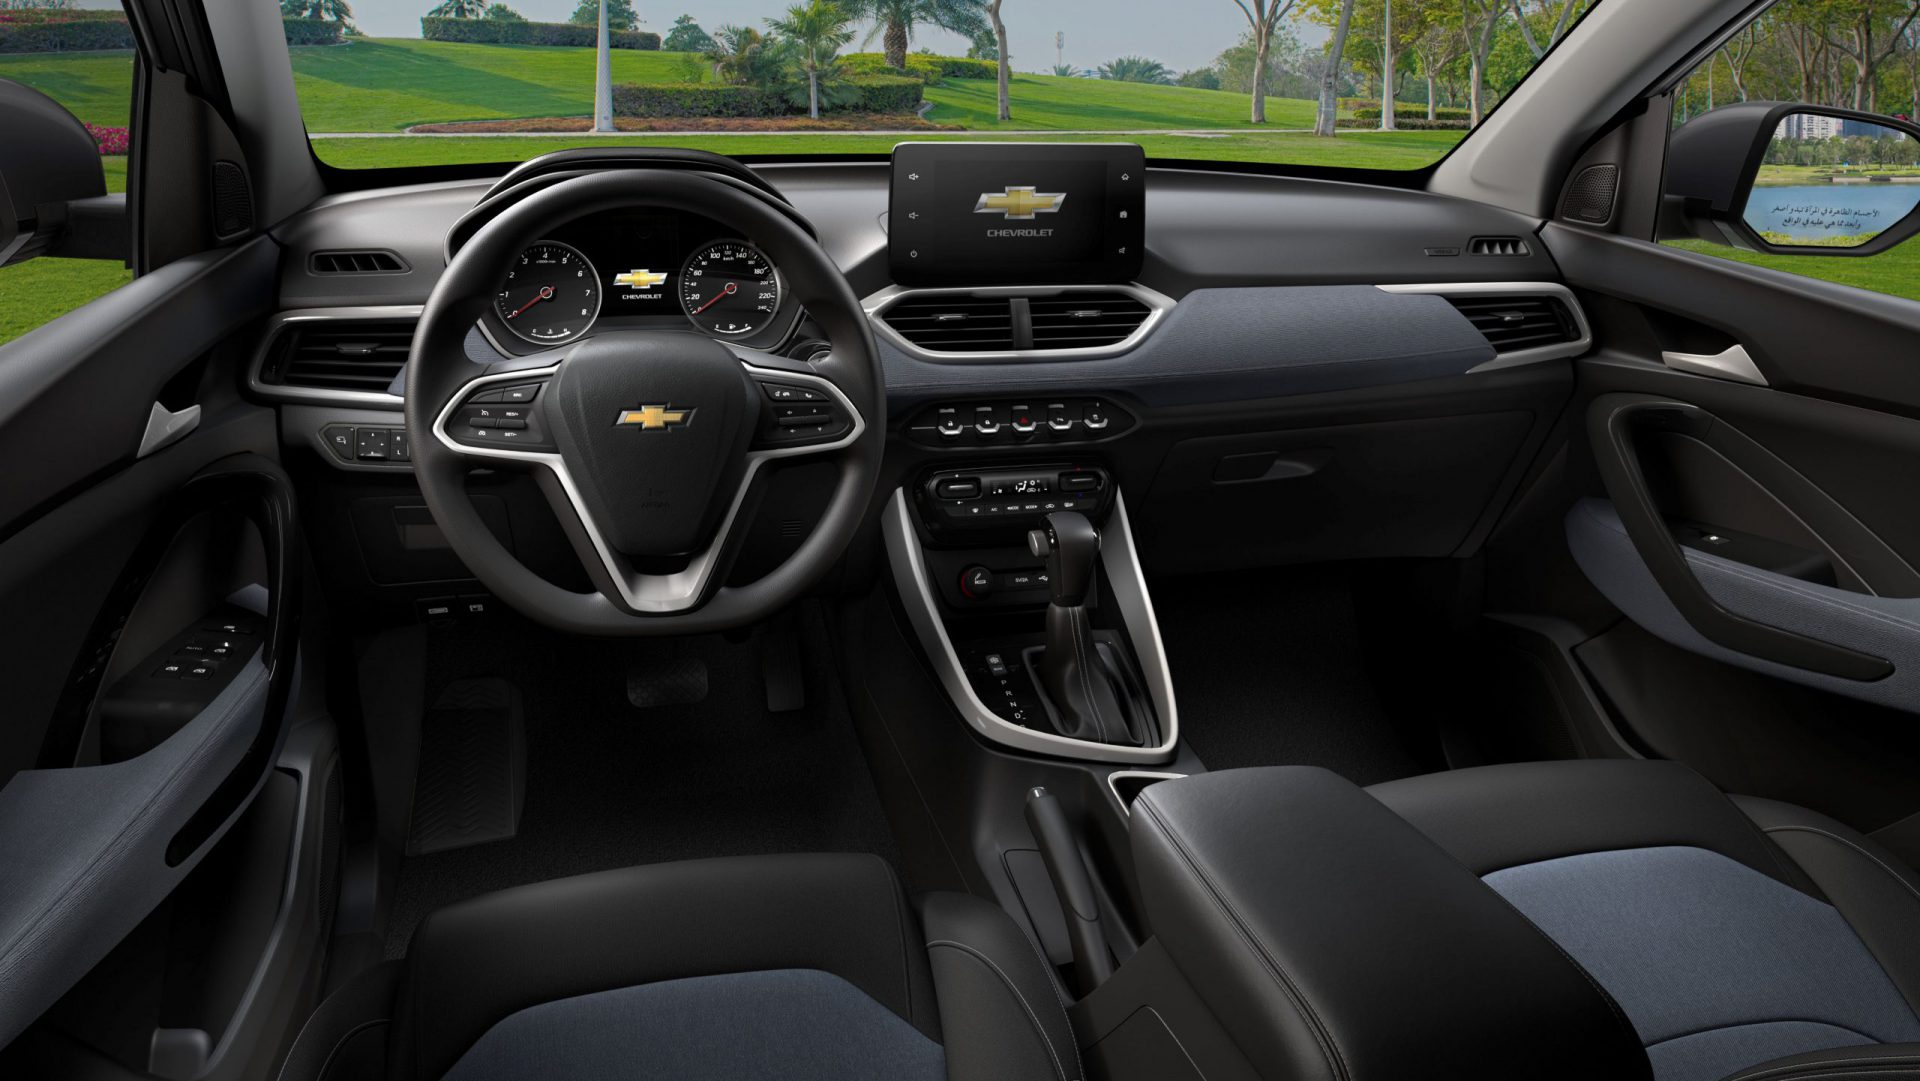 All-new Chevrolet Captiva: The Inside Story